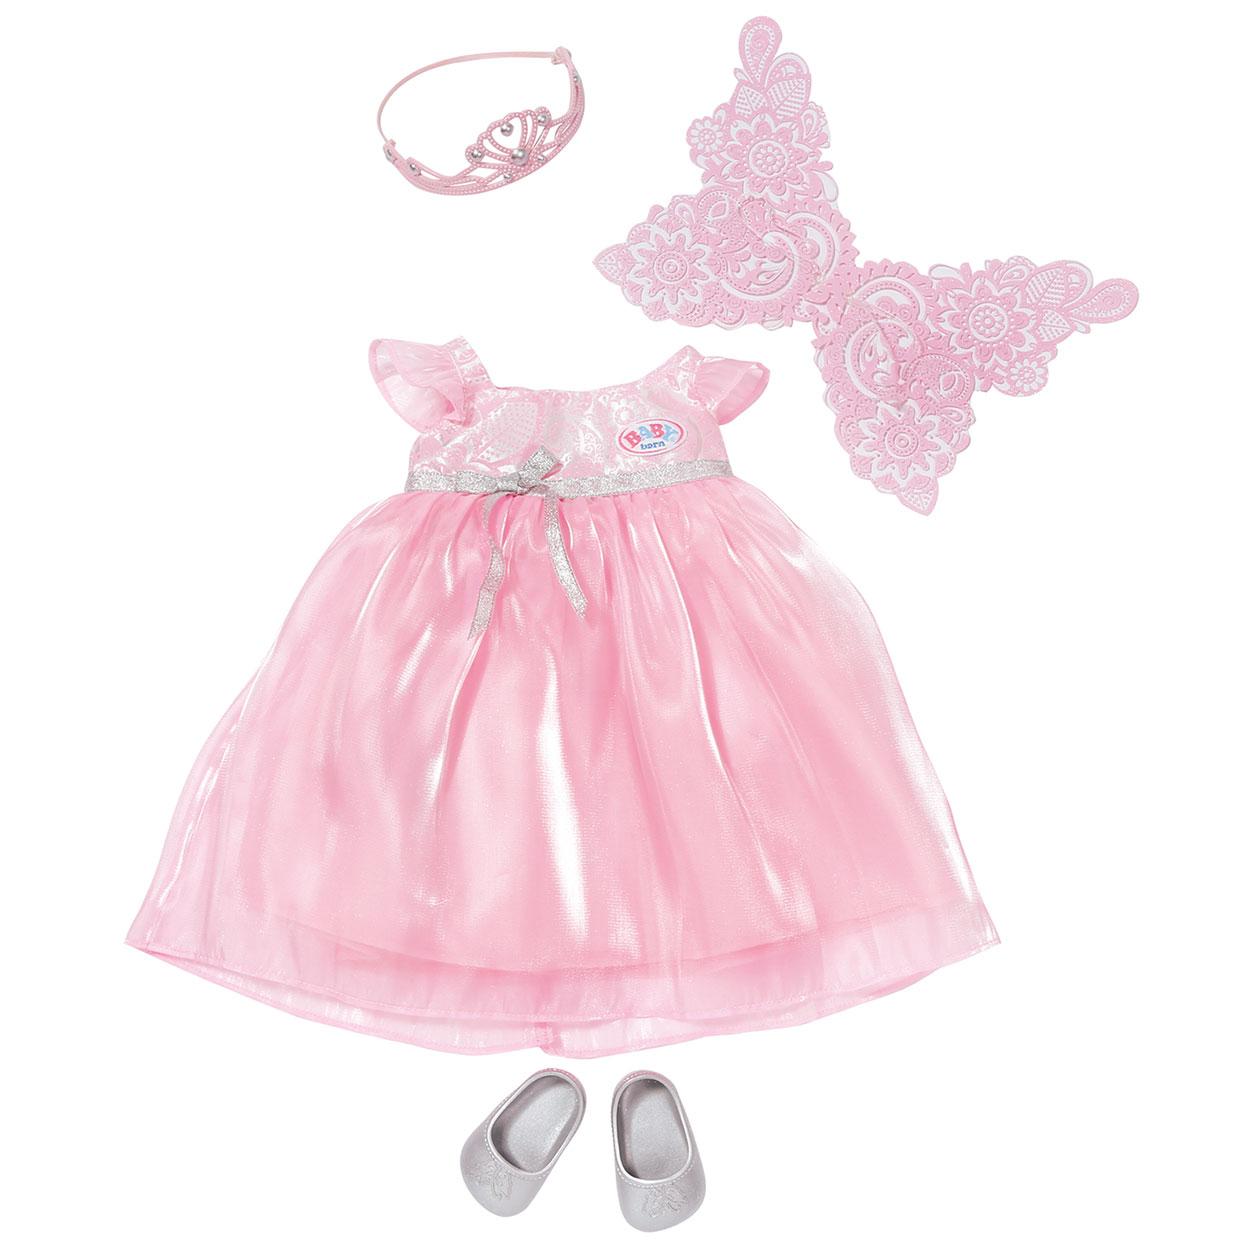 baby prinsessenjurk